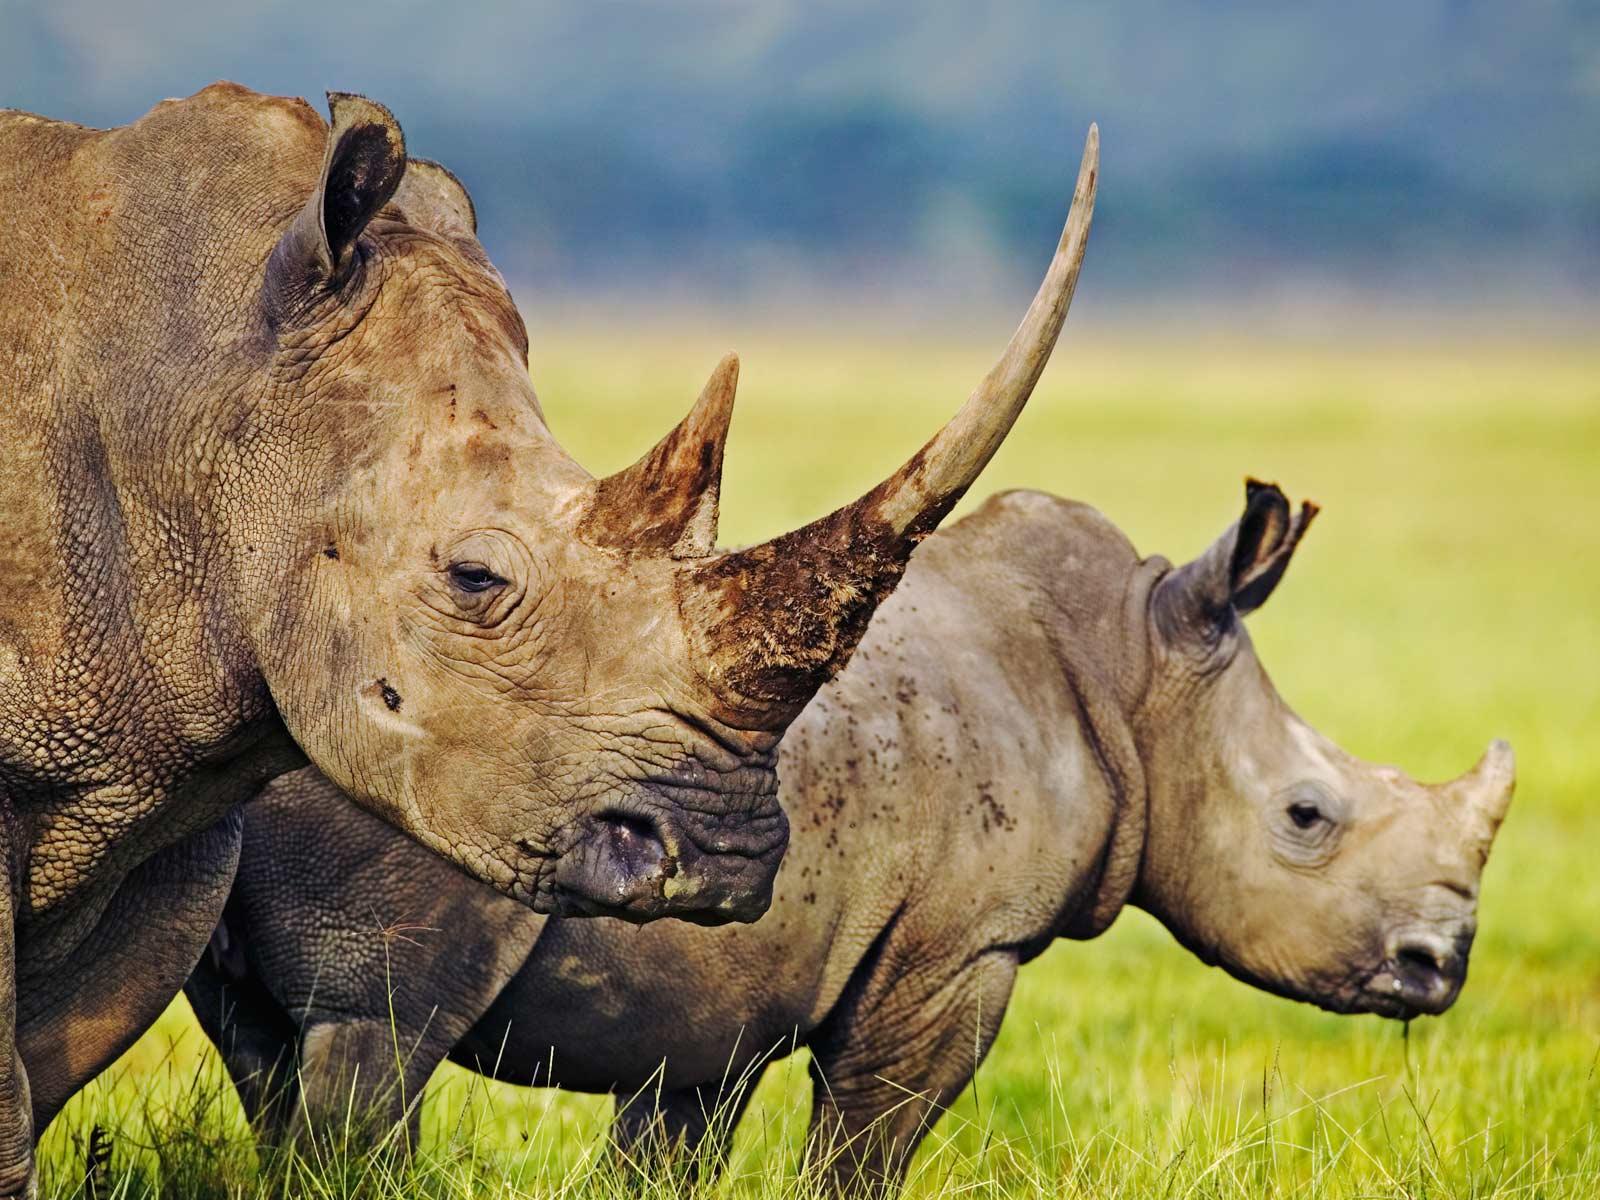 hd wallpaper rhino | dwitongelu